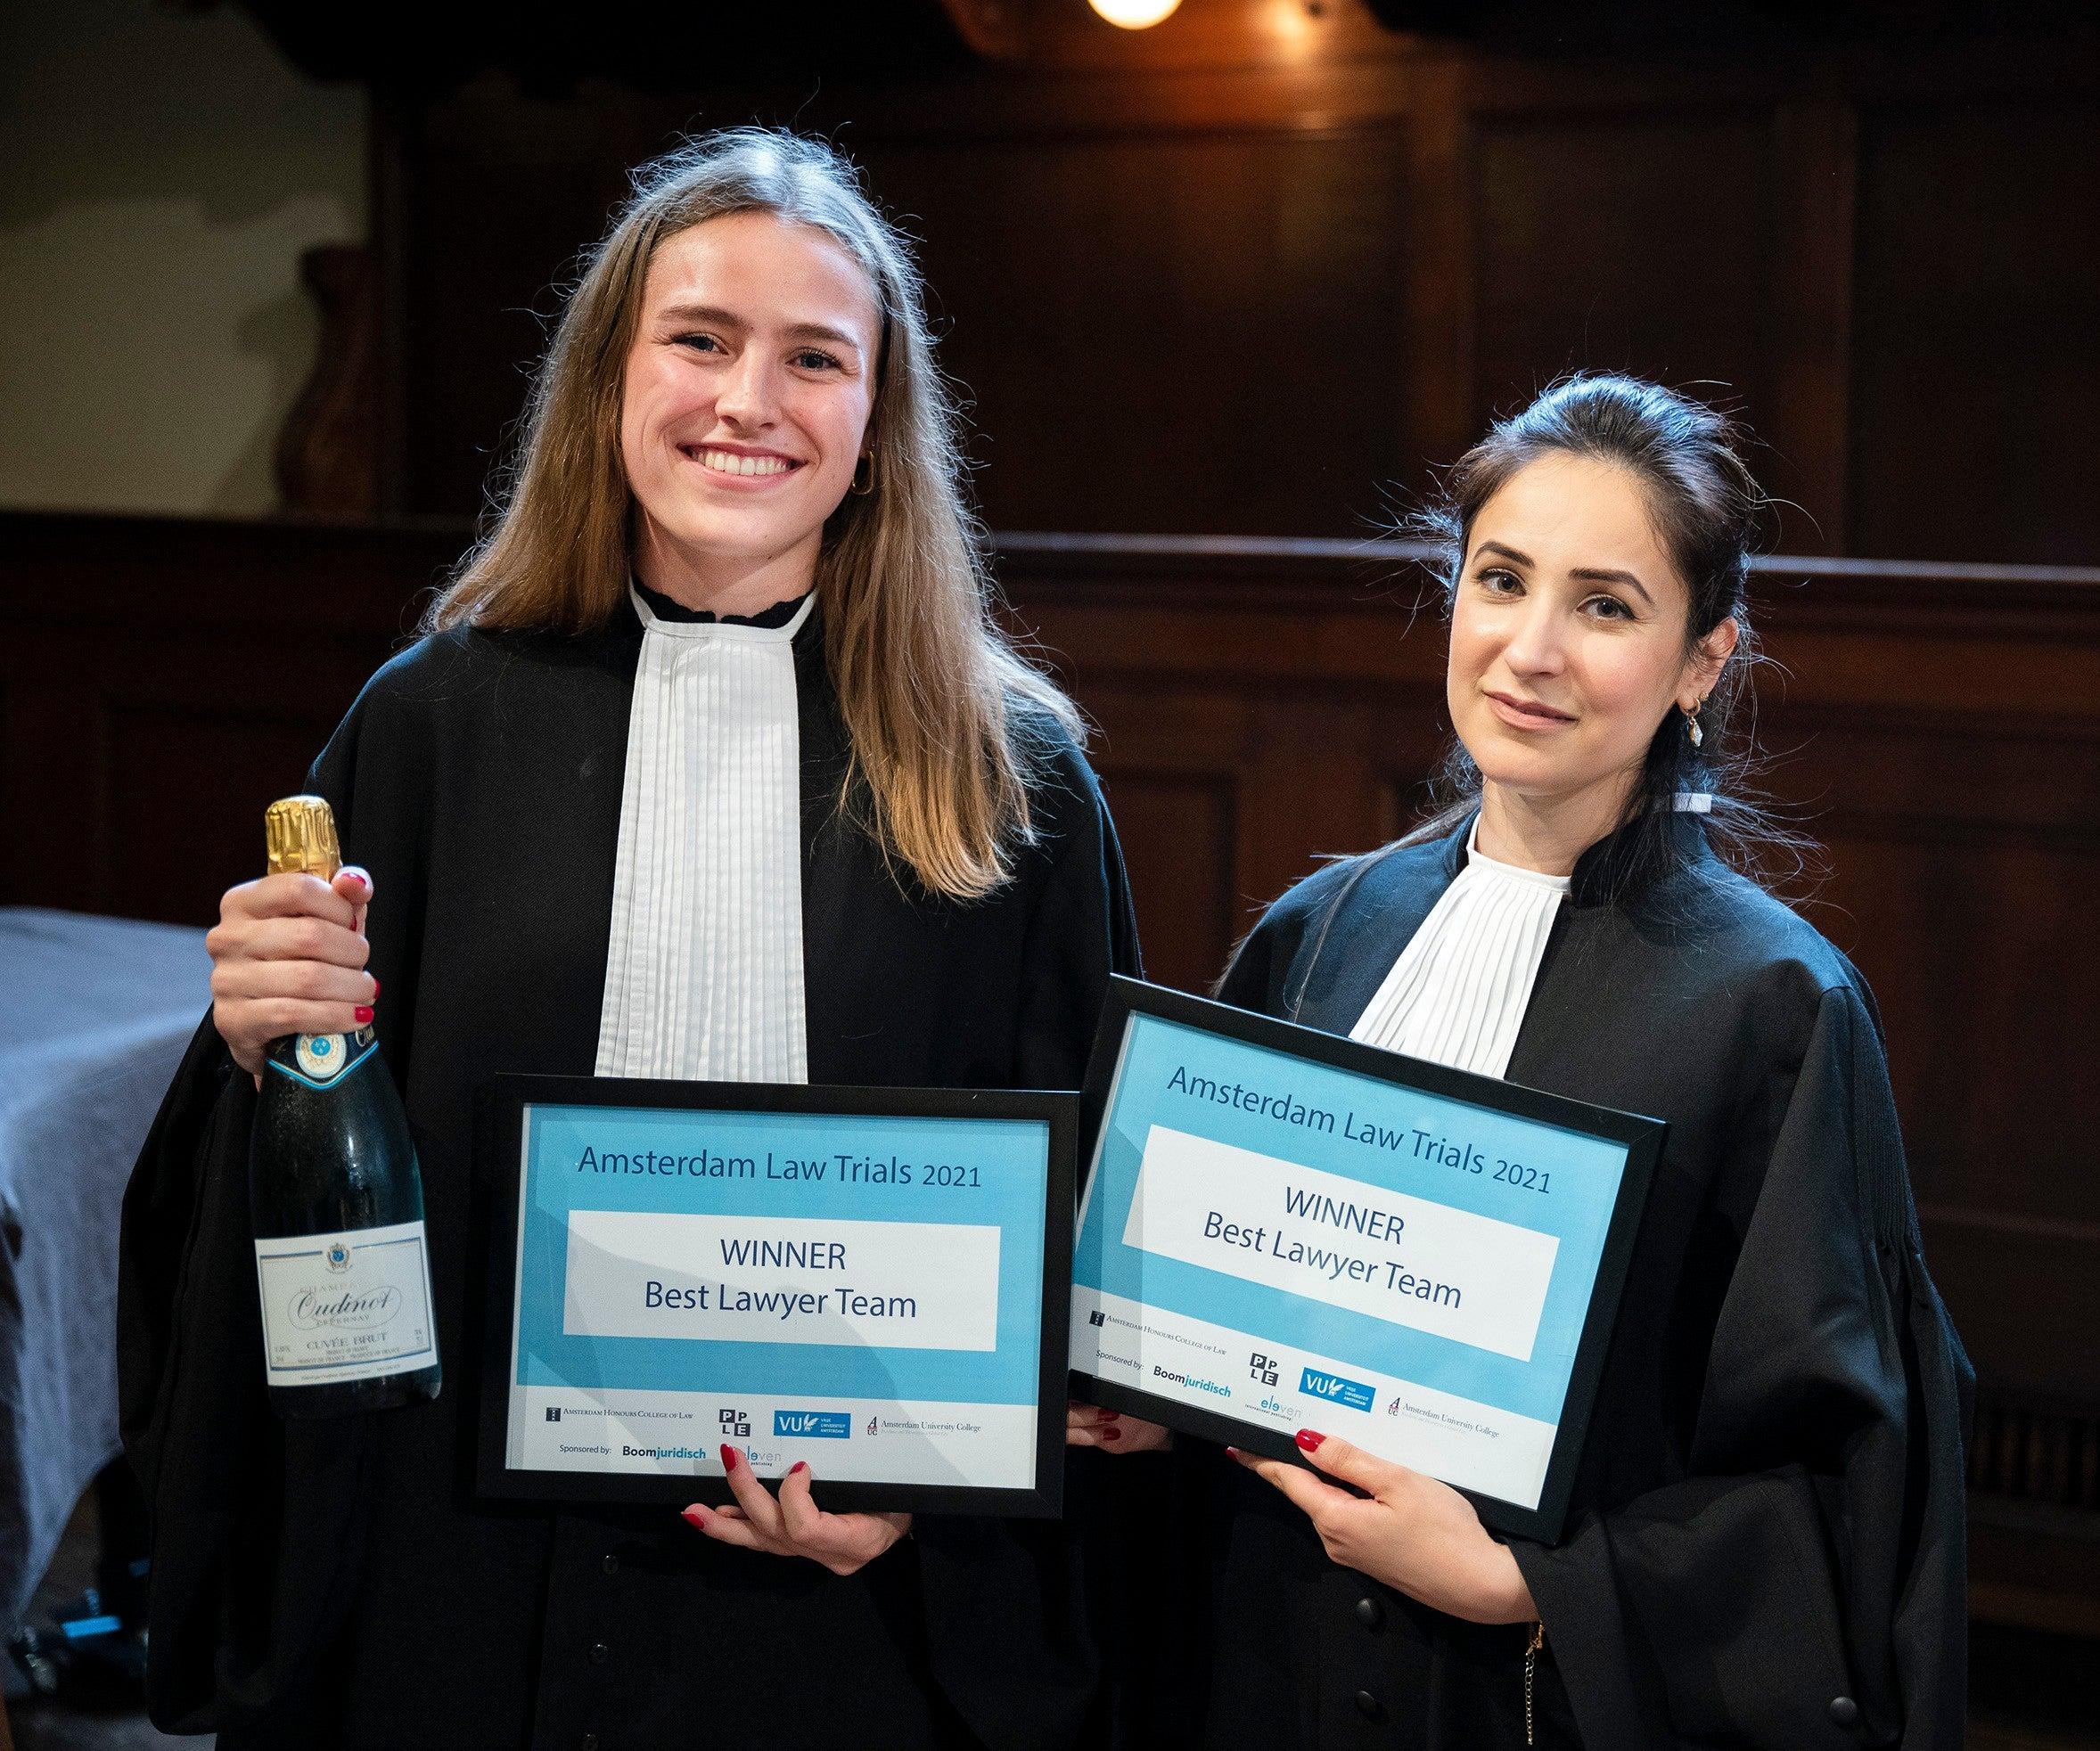 Bowien Ravesteijn and Nadia Rashid (Best Lawyer Team)